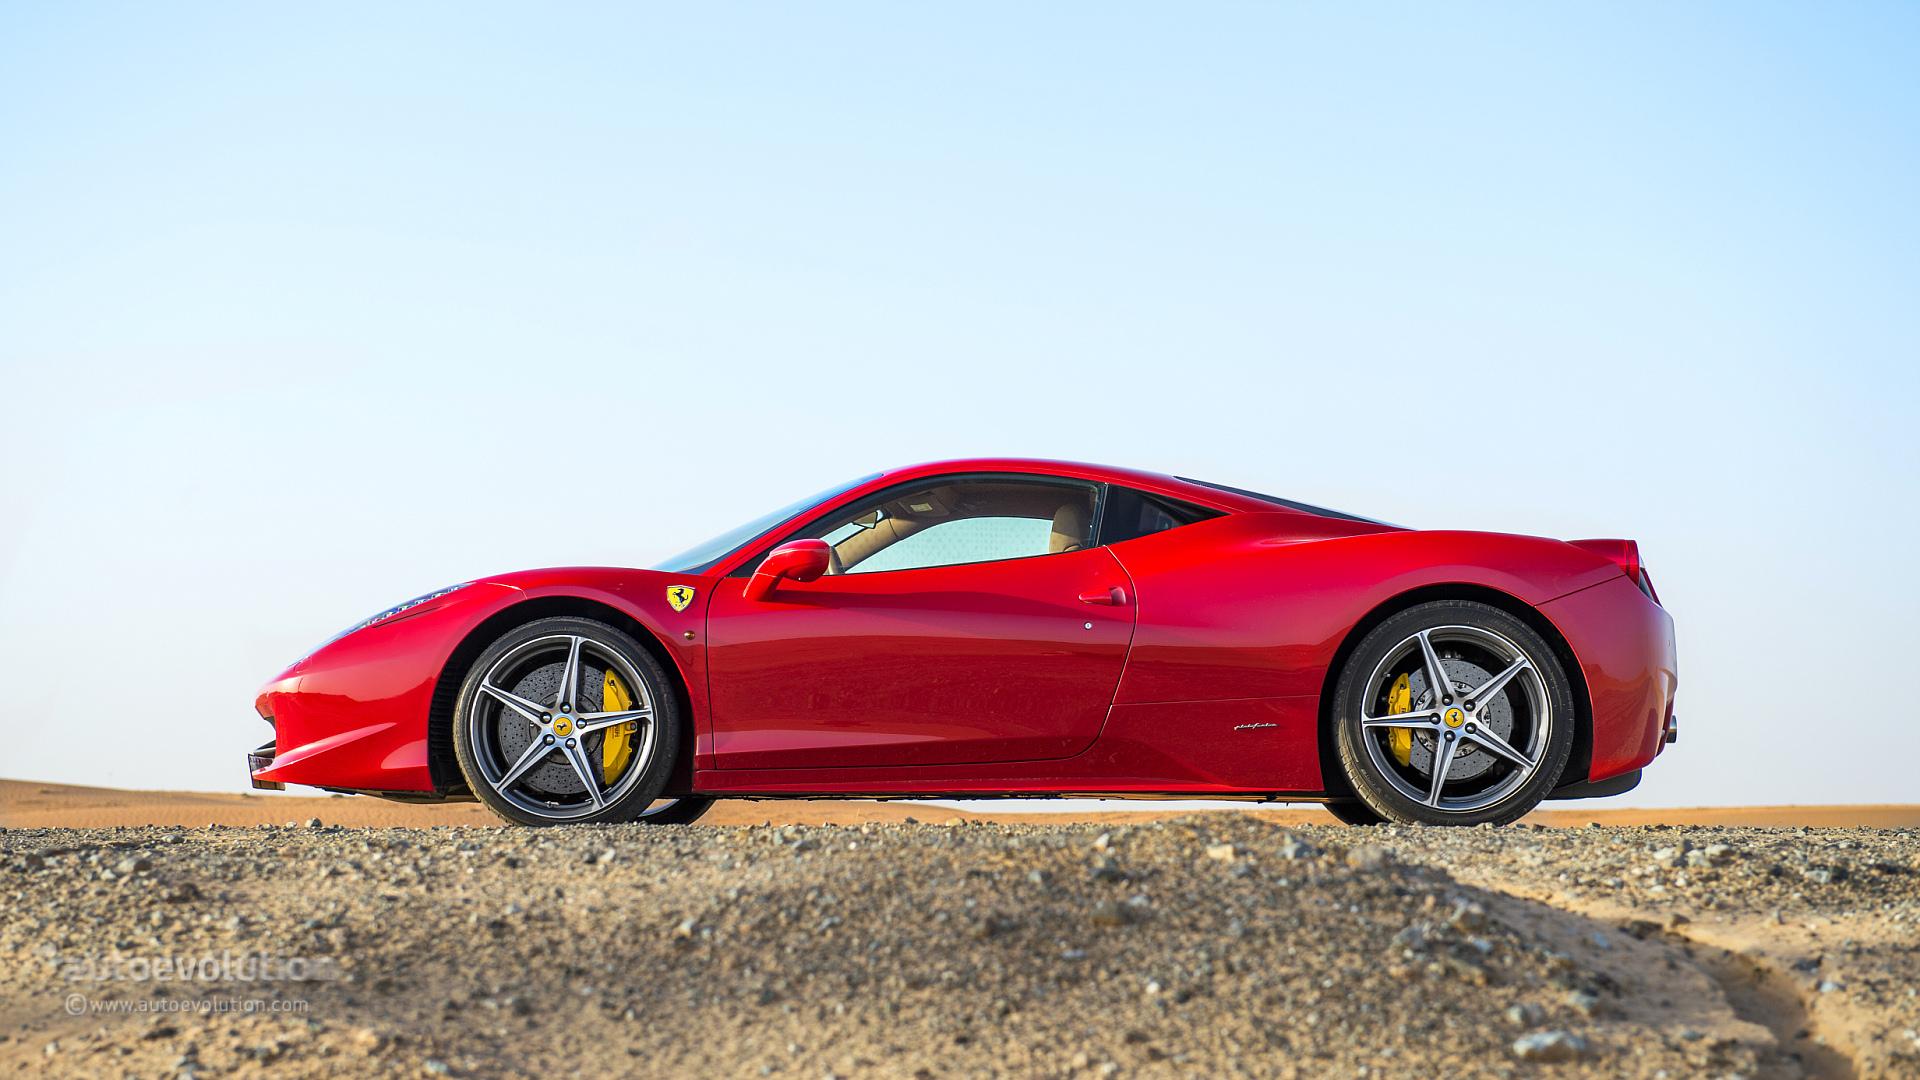 Drift Car Wallpaper Images Ferrari 458 Italia Review Autoevolution